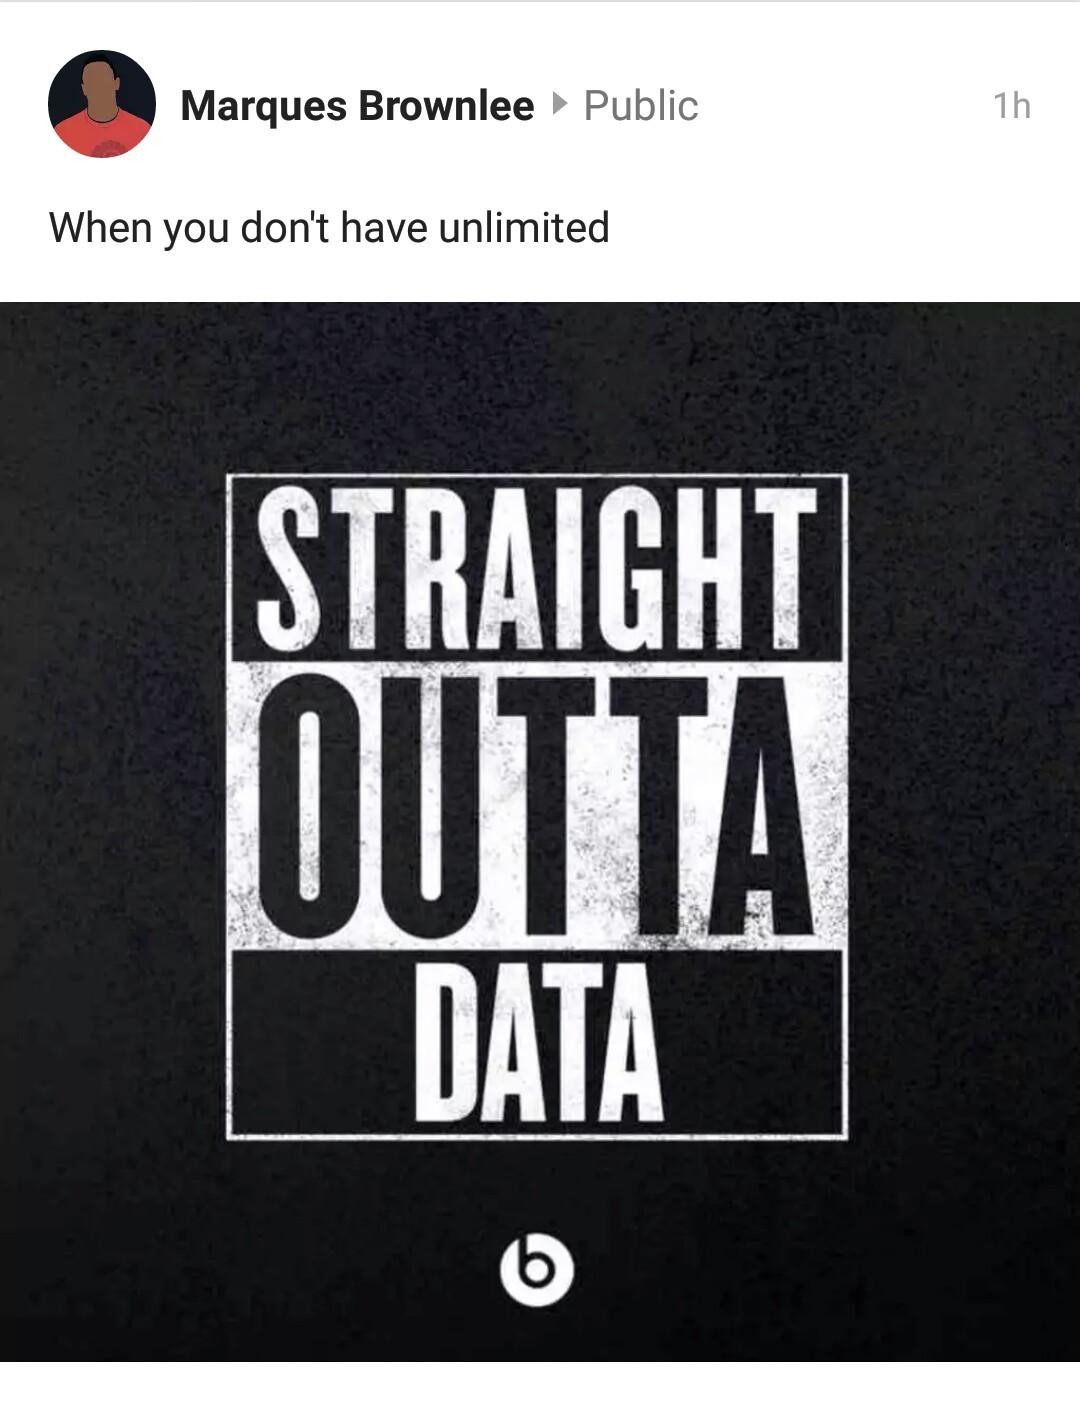 MKBHD - meme